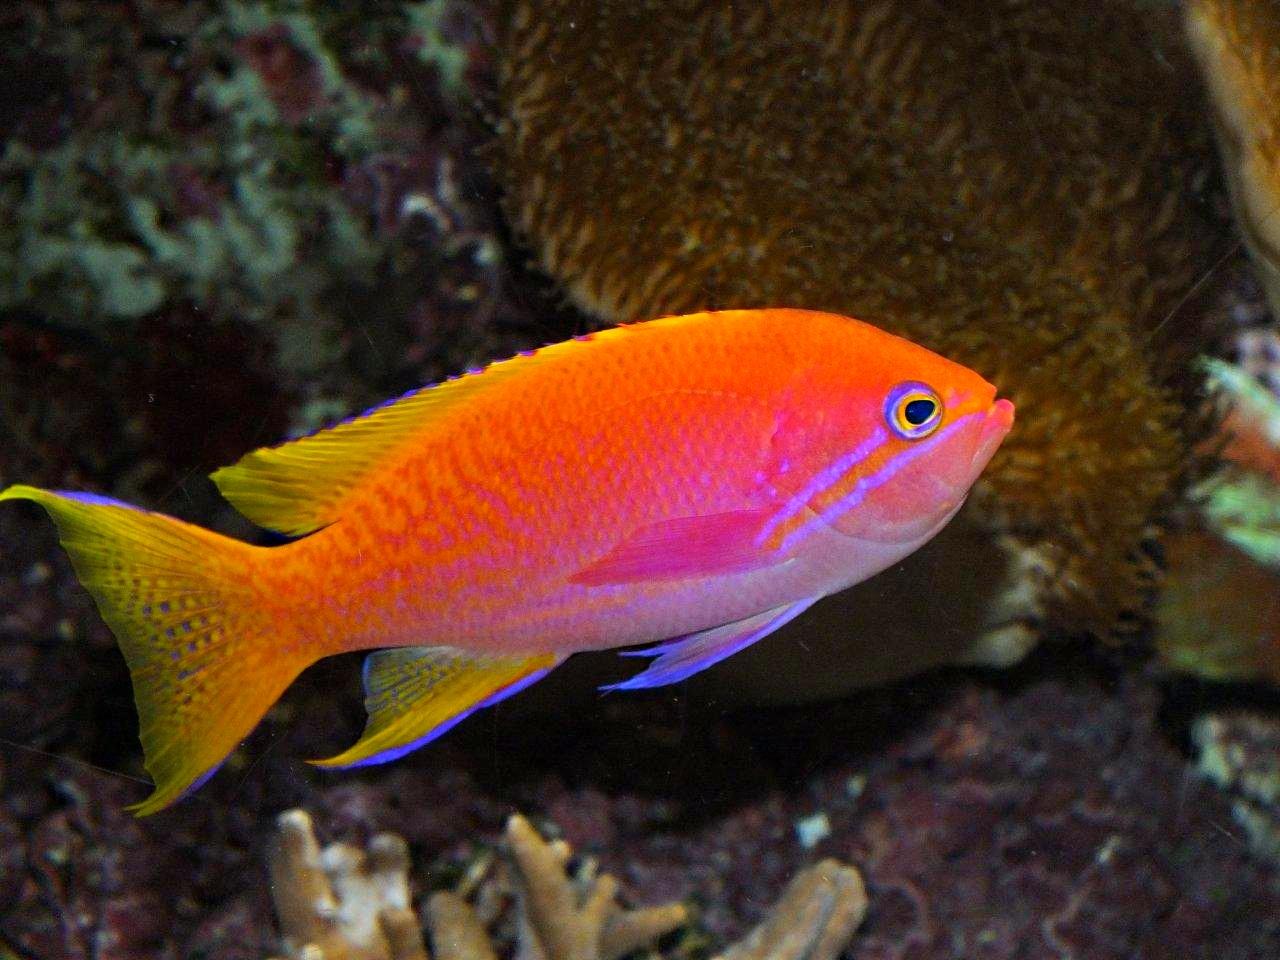 Orange Anthias Fish - saltwater fish at the Shedd Aquarium in Chicago - photo by Thomas Peace 2013